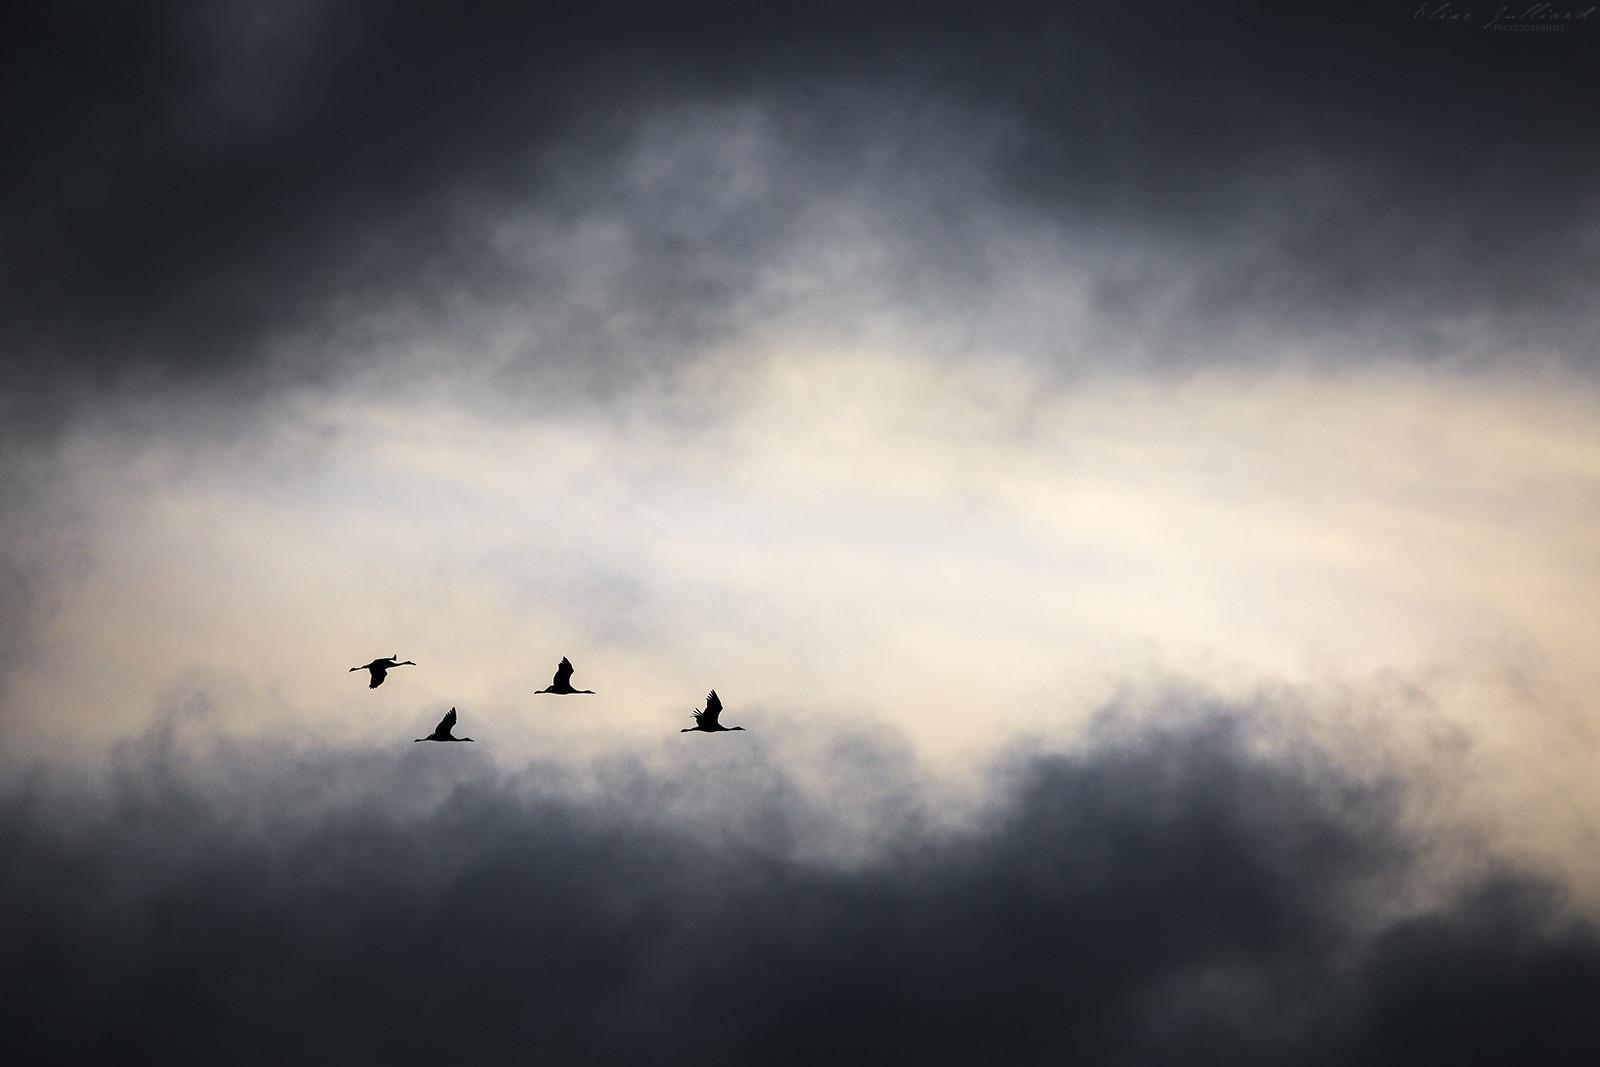 elise-julliard-photographe-lyon-rhone-alpes-photo-oiseaux-grues-cendrees-nuage-champagne-ardenne-montier-en-der